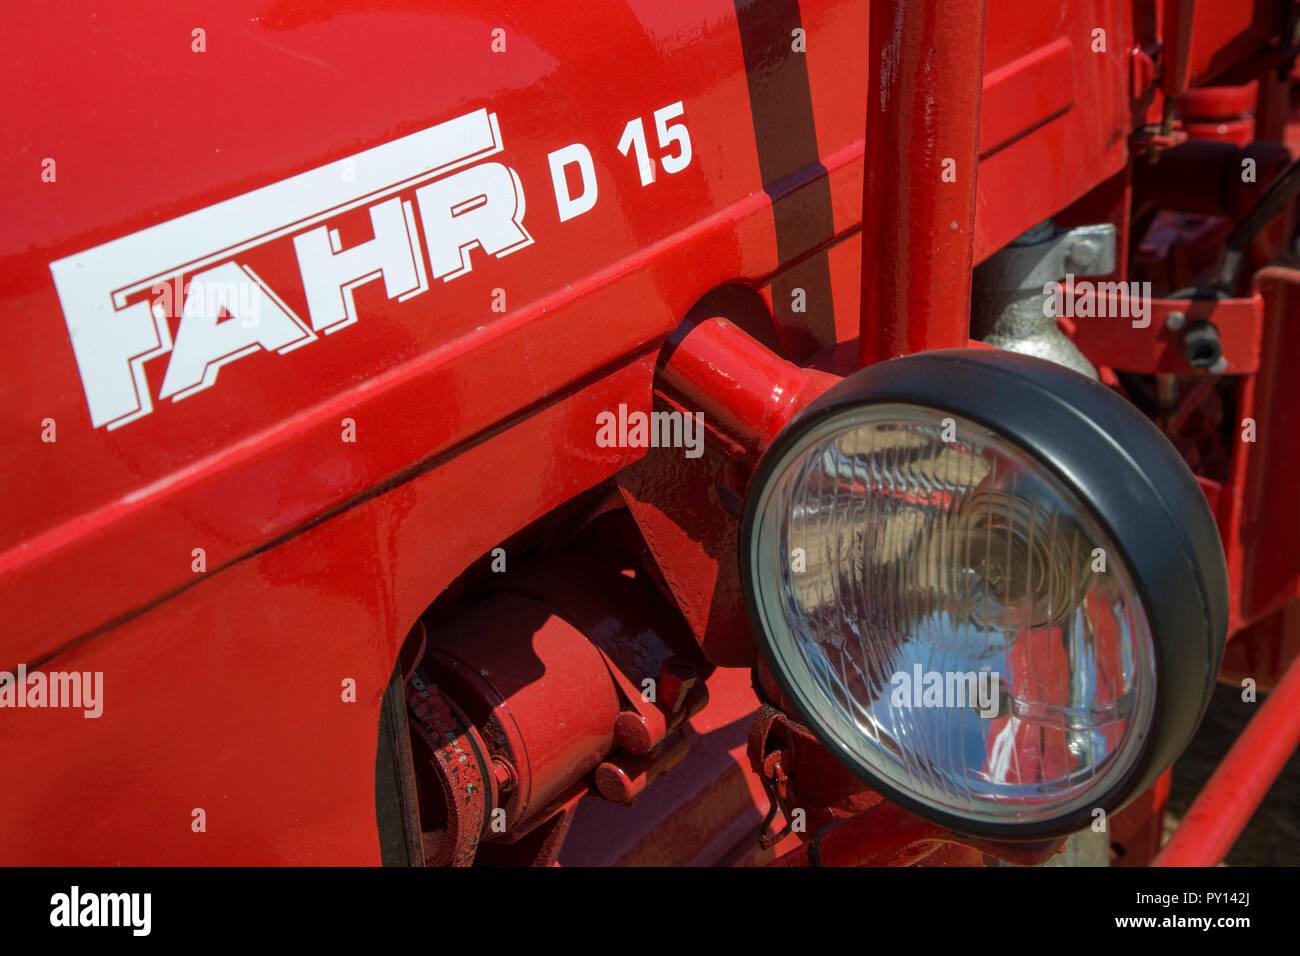 Nahaufnahme von roten Oldtimer diesel Traktor Fahr D 15. Stockbild